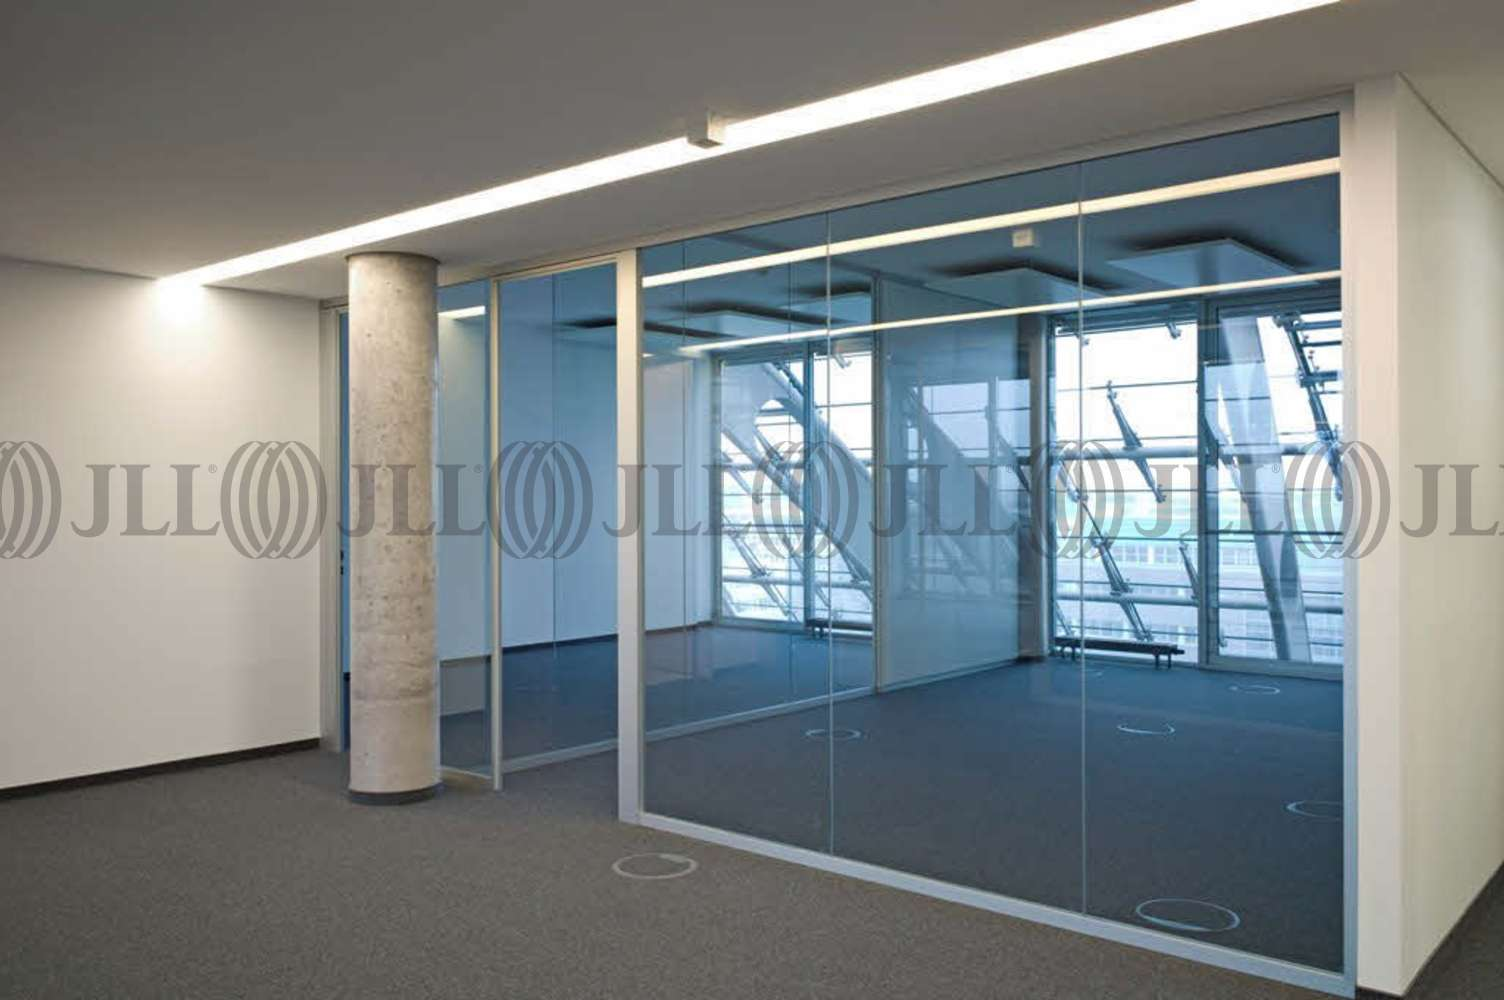 Büros Hamburg, 20537 - Büro - Hamburg, Hammerbrook - H0114 - 9404613